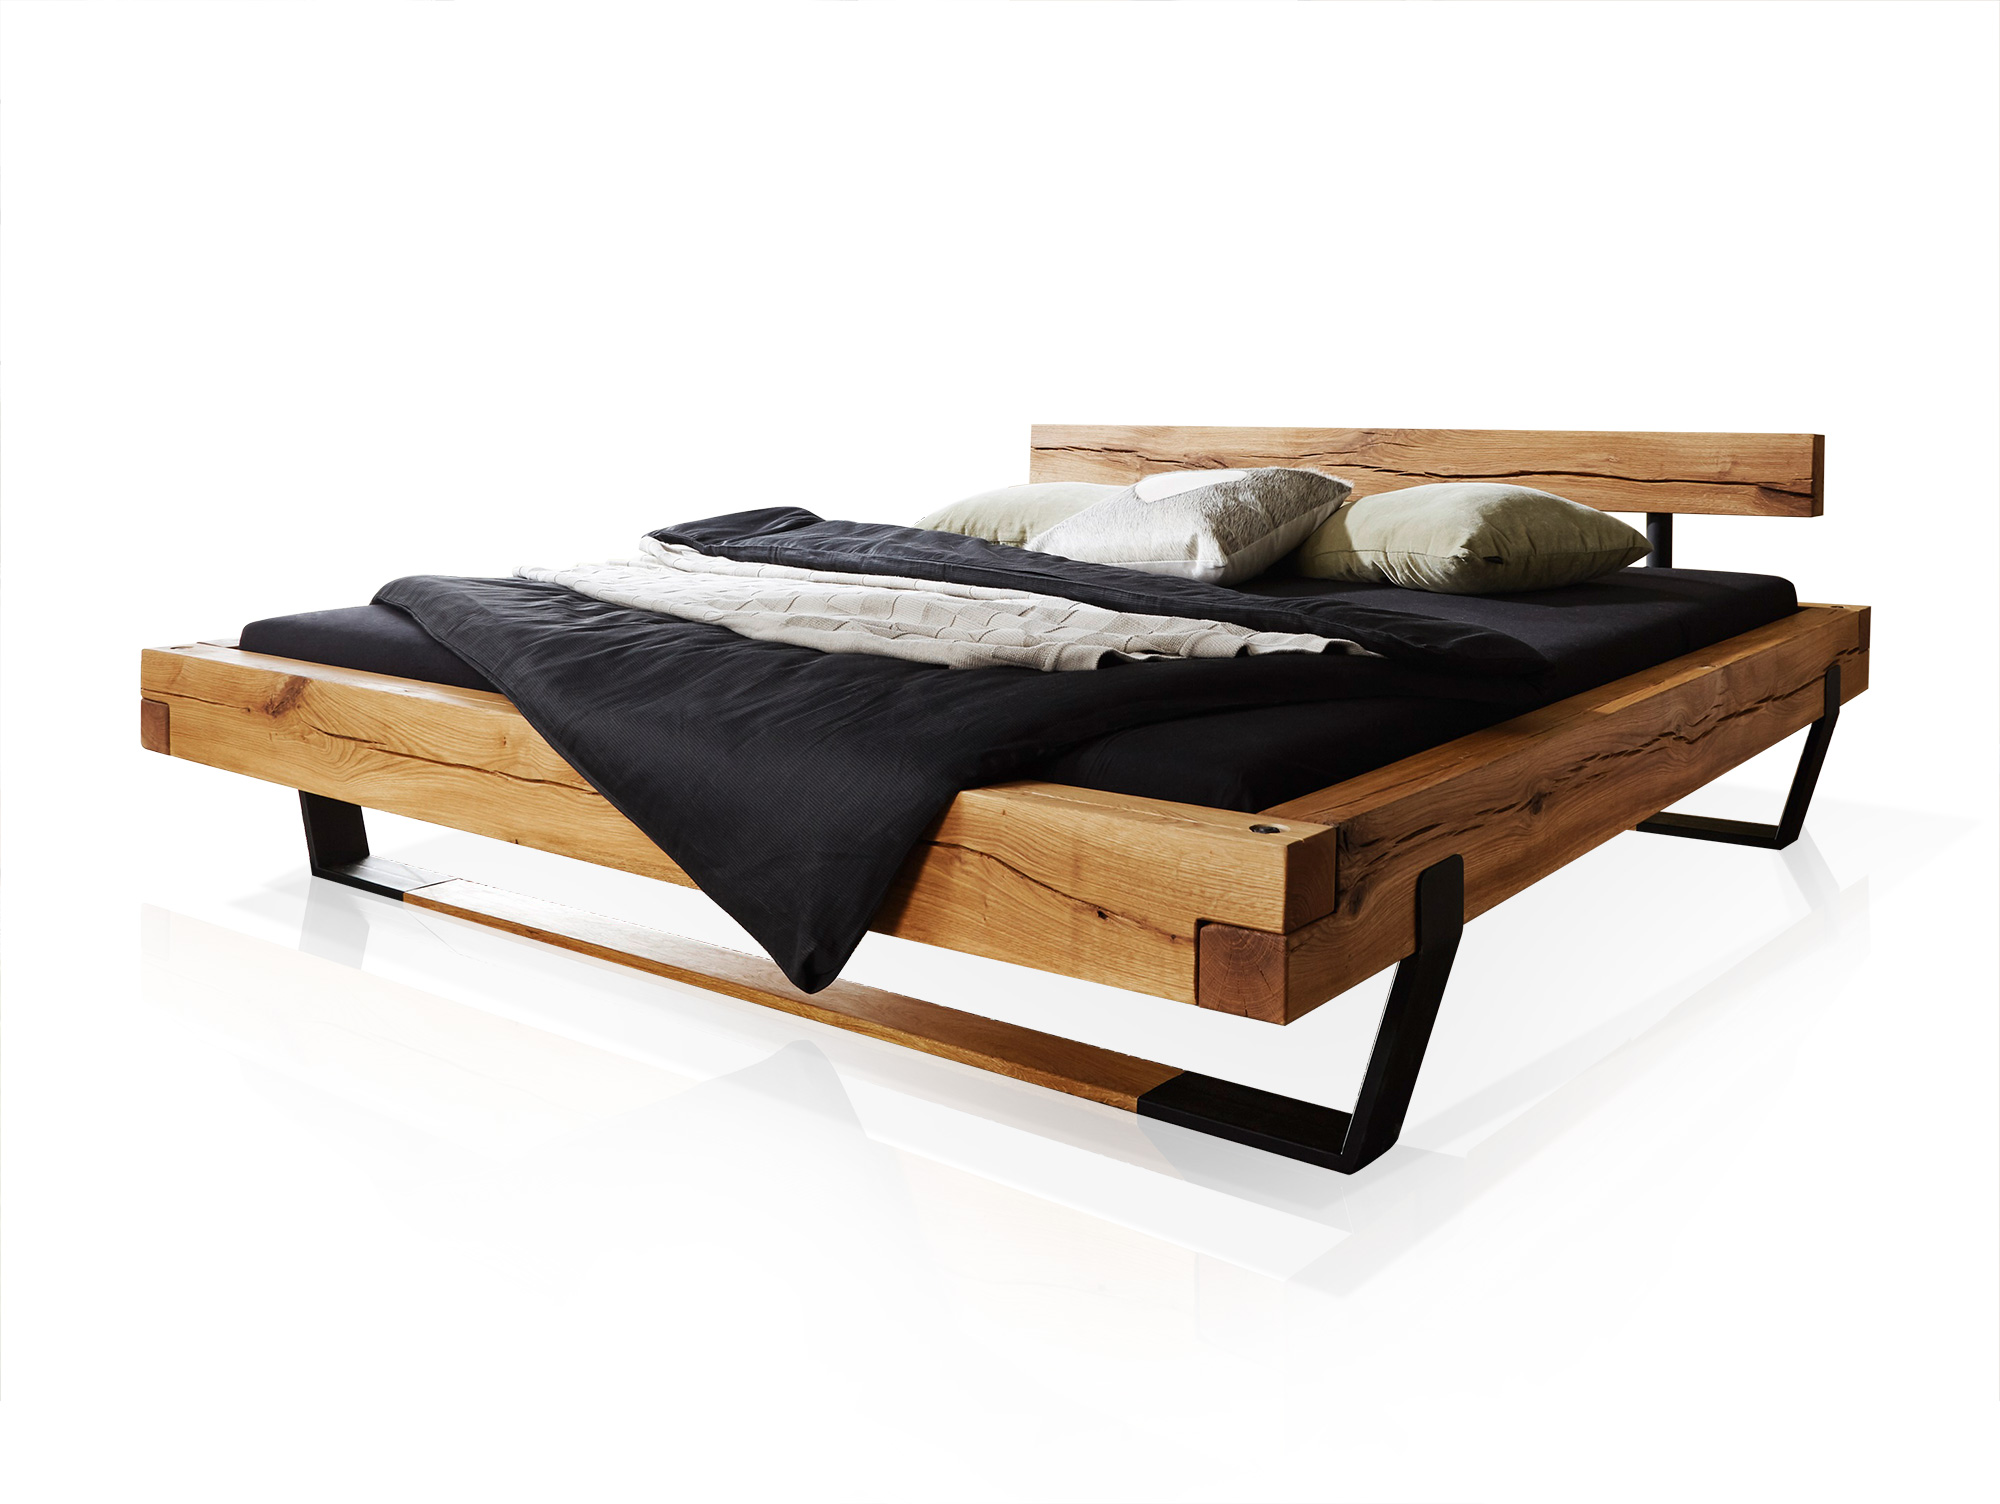 Full Size of Bett Massivholz Ausziehbar Betten Minion Big Sofa Mit Hocker 160x200 Küche Insel Ruf Ebay Roba Bett Bett 160x200 Mit Lattenrost Und Matratze